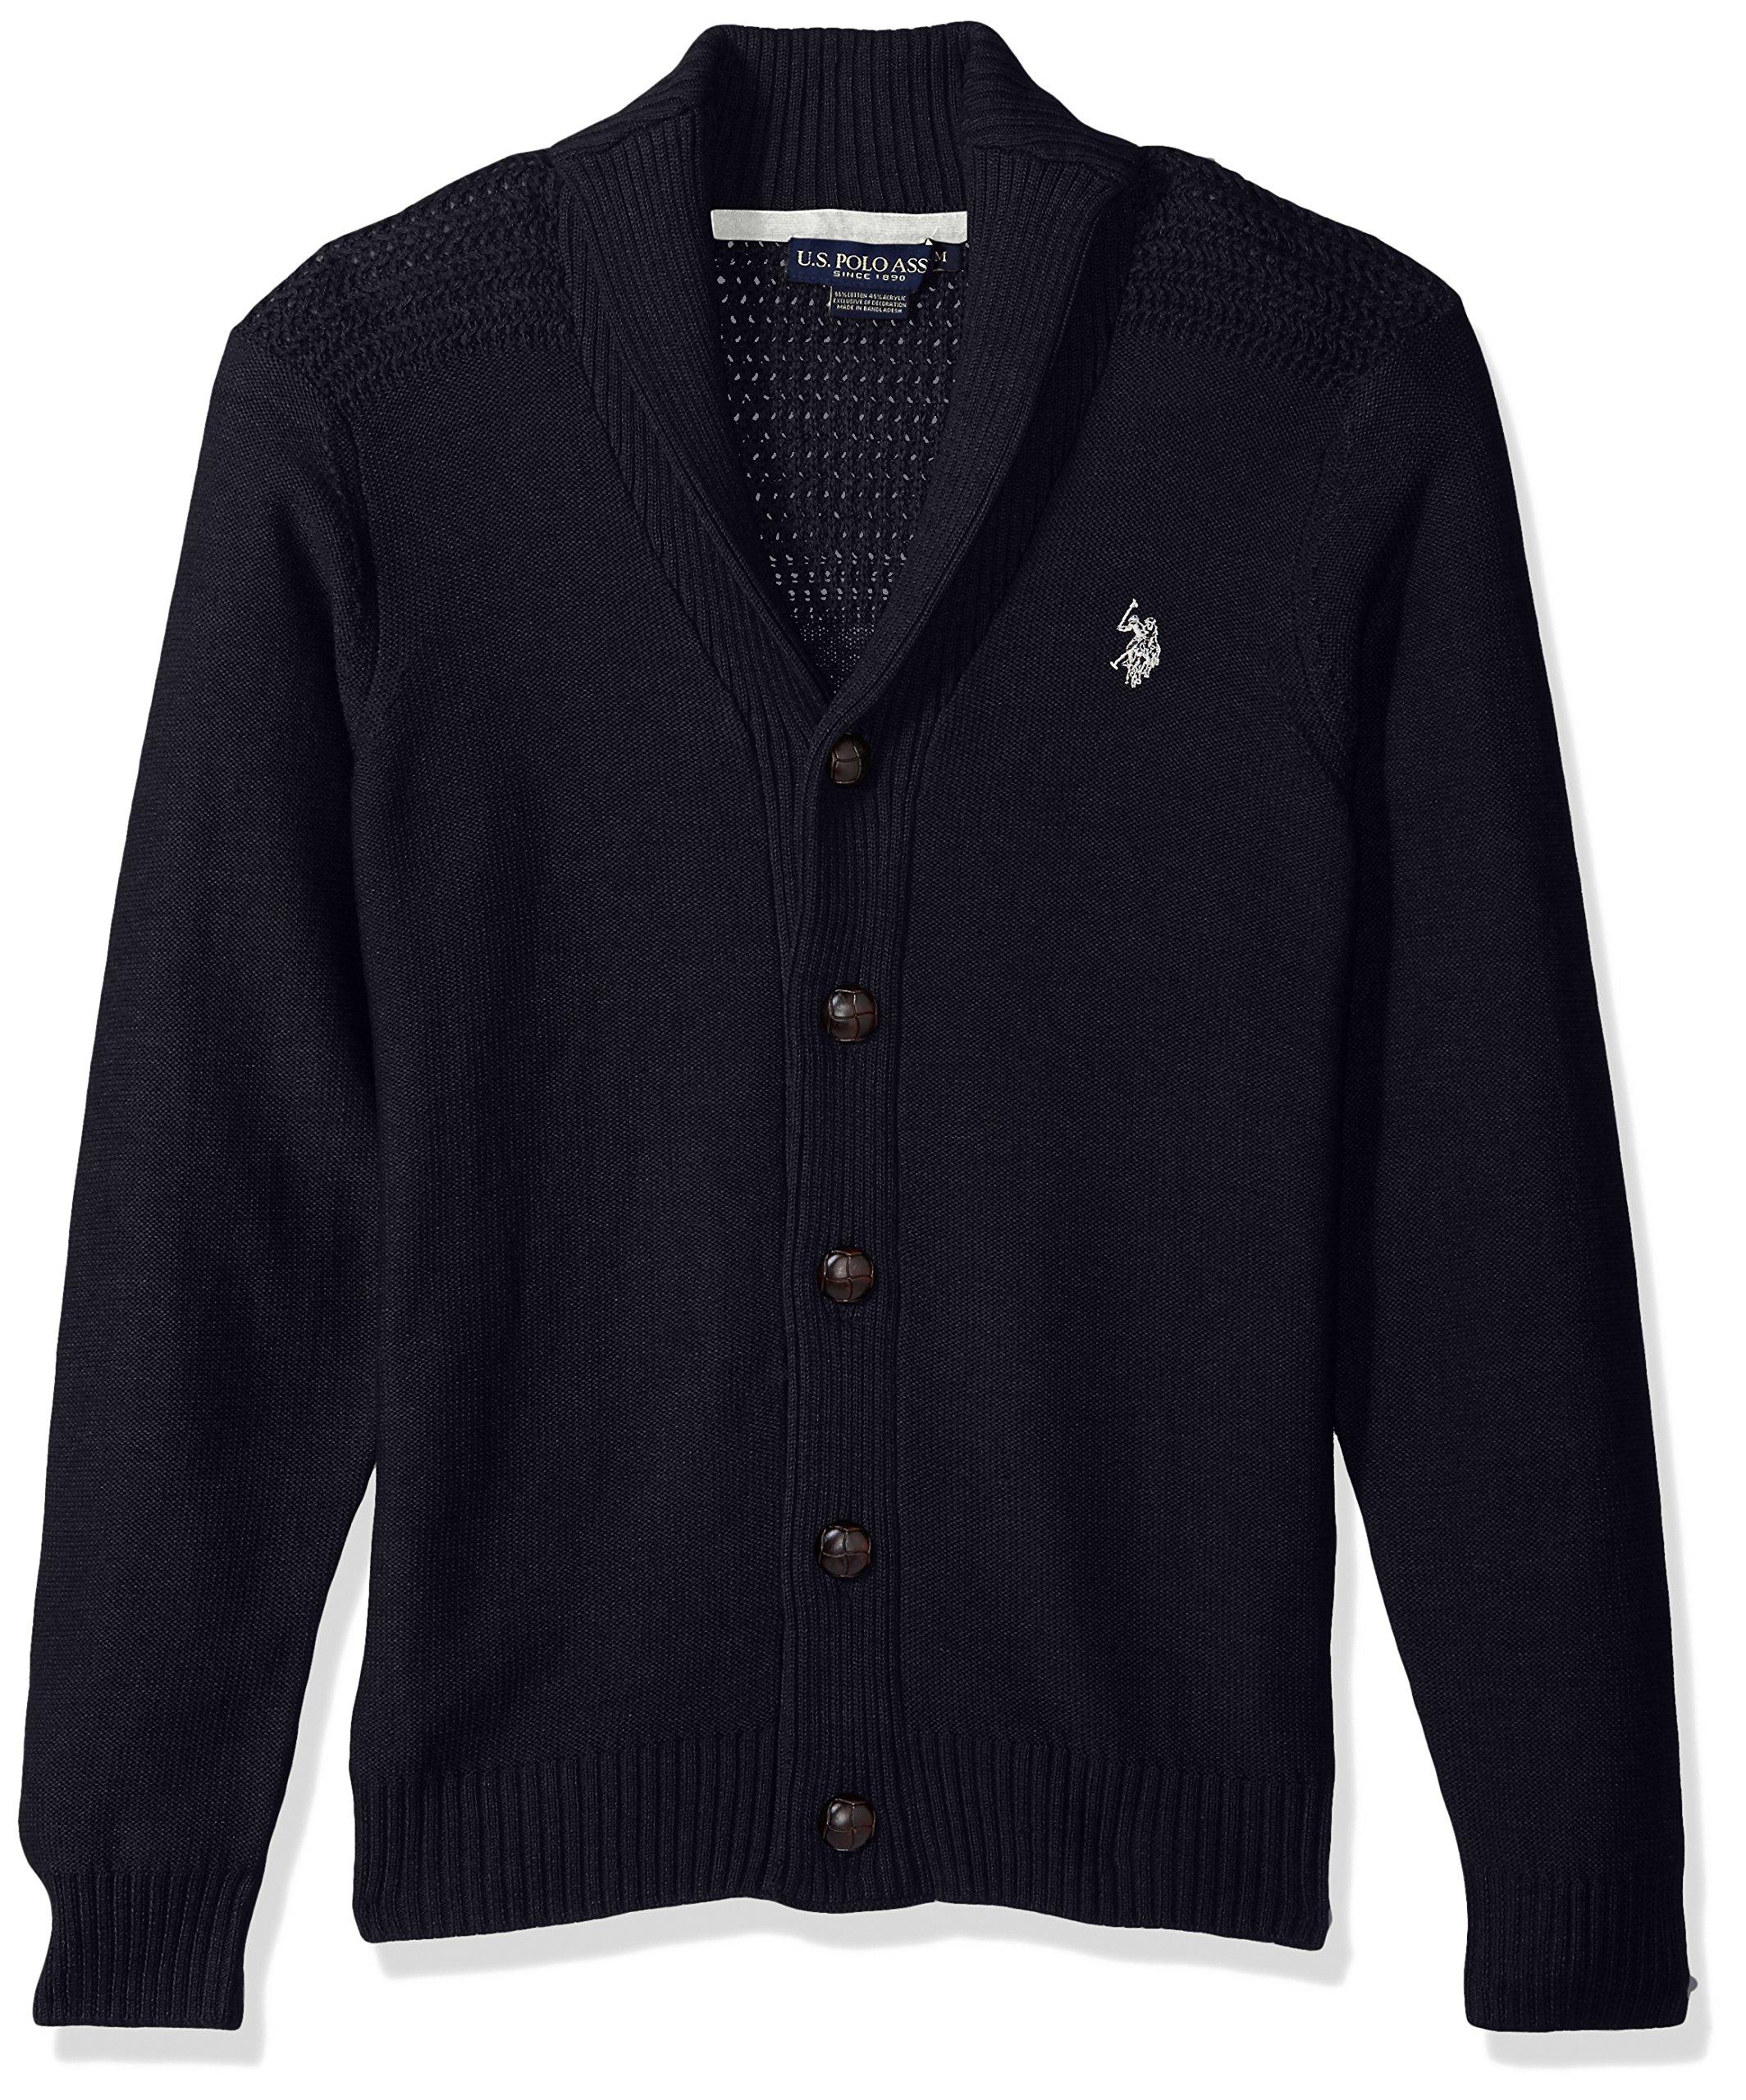 U.S. Polo Assn. Men's Reverse Jersey Shawl Collar Cardigan, Navy, X-Large